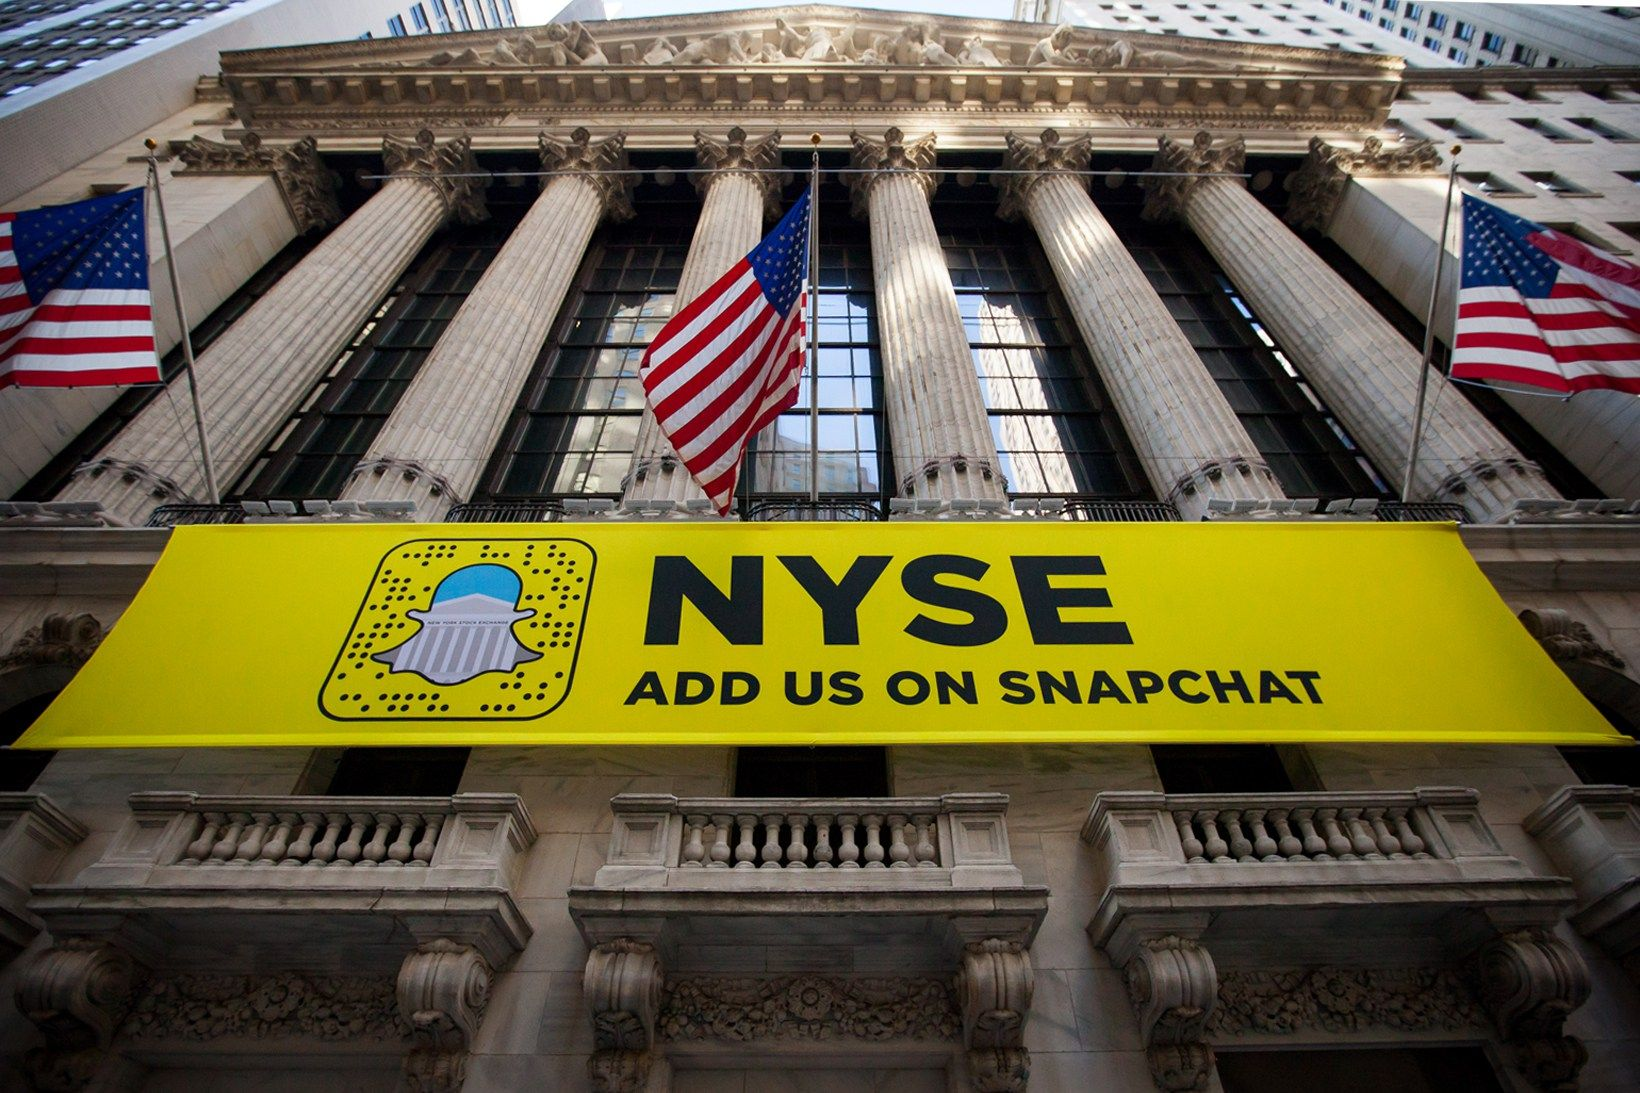 Snapchat's IPO Values at 24 Billion USD Despite Major